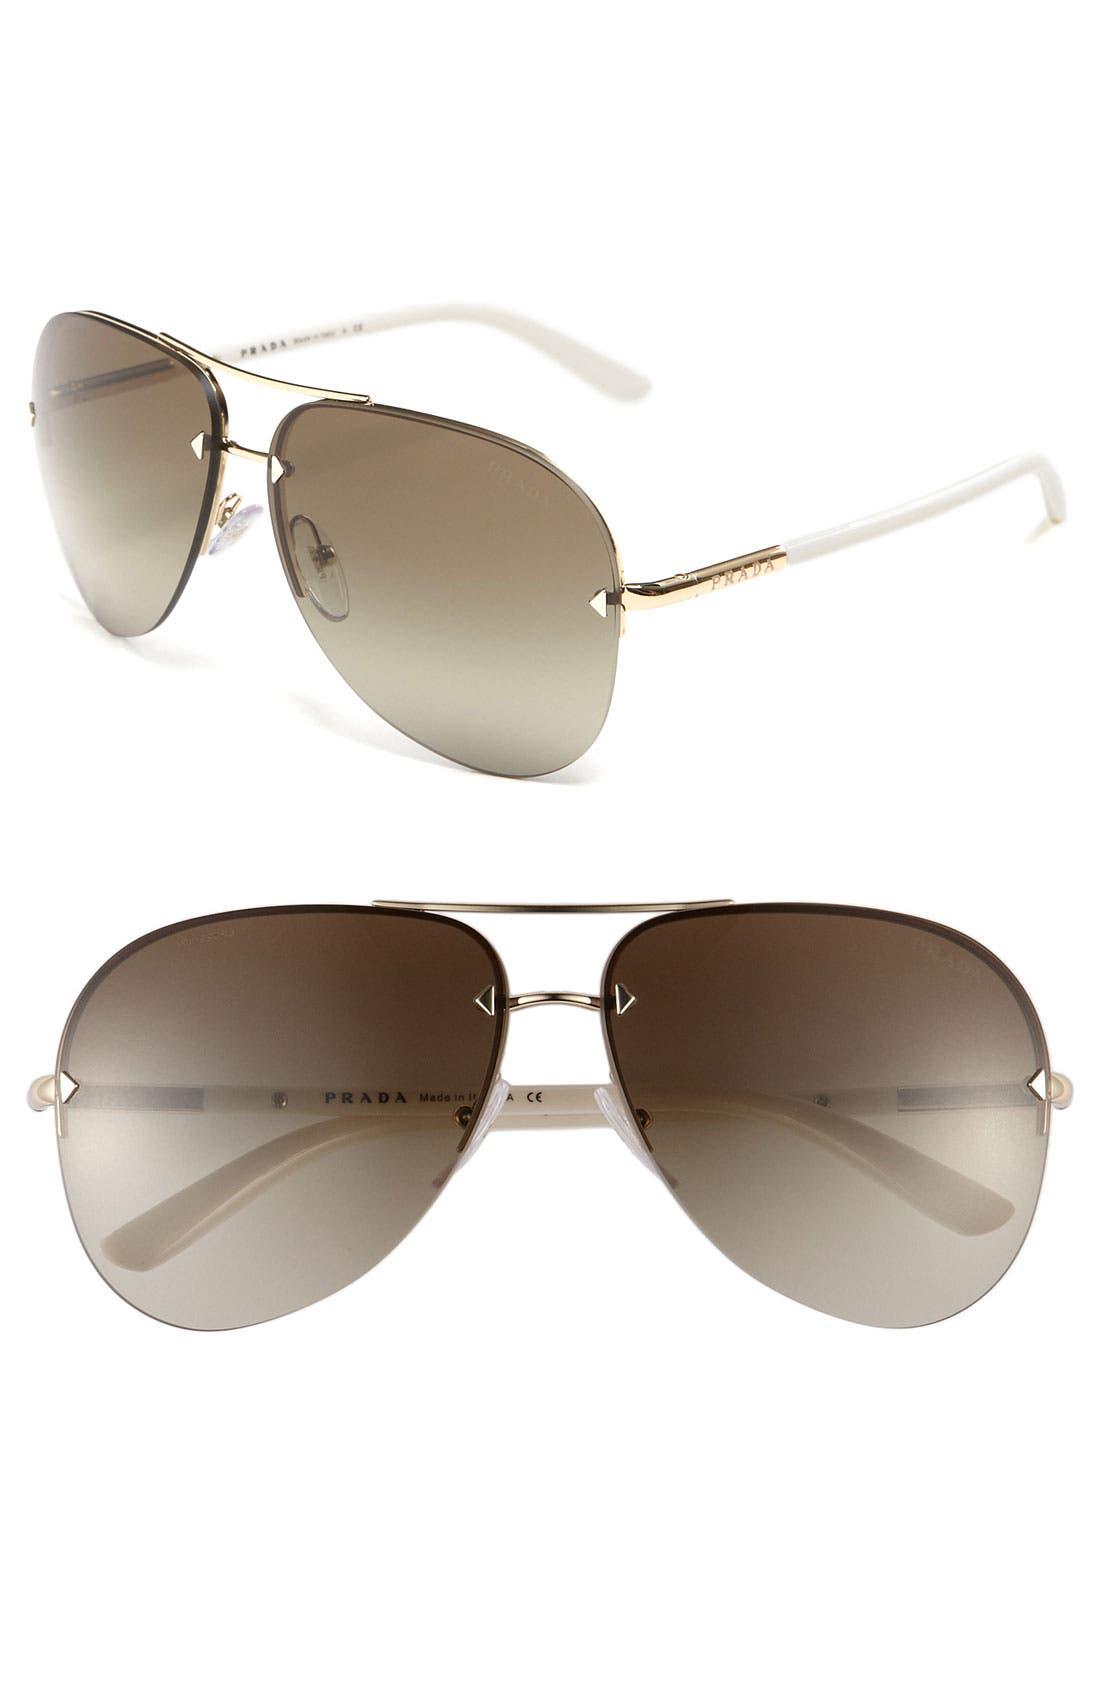 Alternate Image 1 Selected - Prada 61mm Aviator Sunglasses